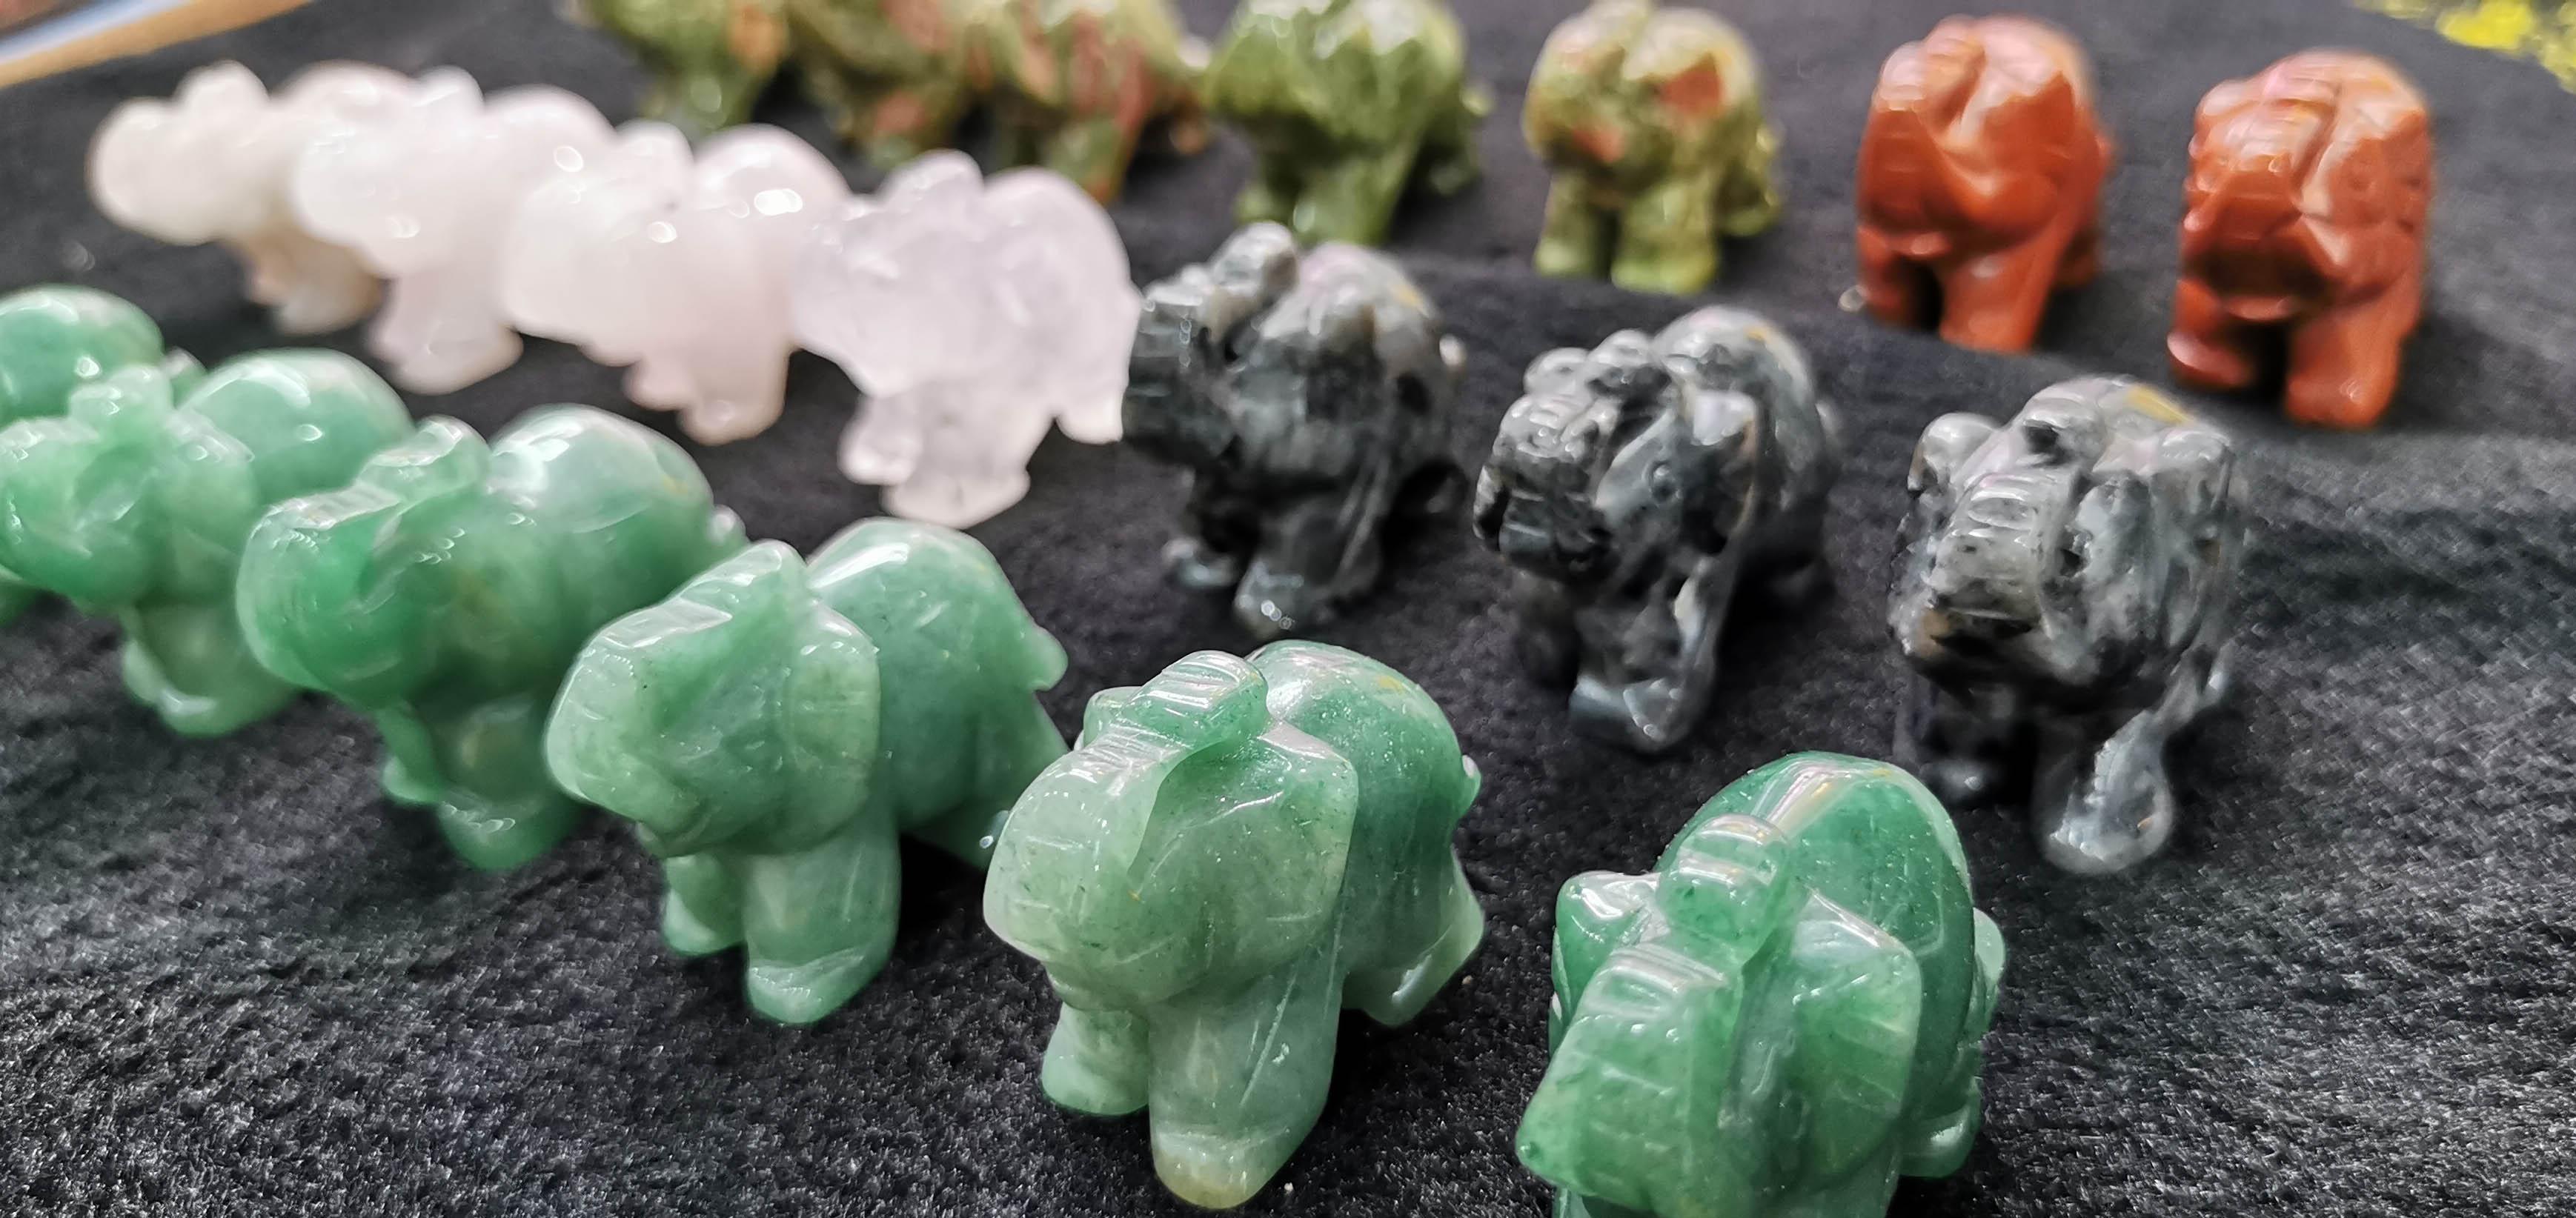 Batch Assorted Stone POCKET Elephant Crystal Healing Spiritual Support 2-3inch Jewelry Elephant Spirit Animal